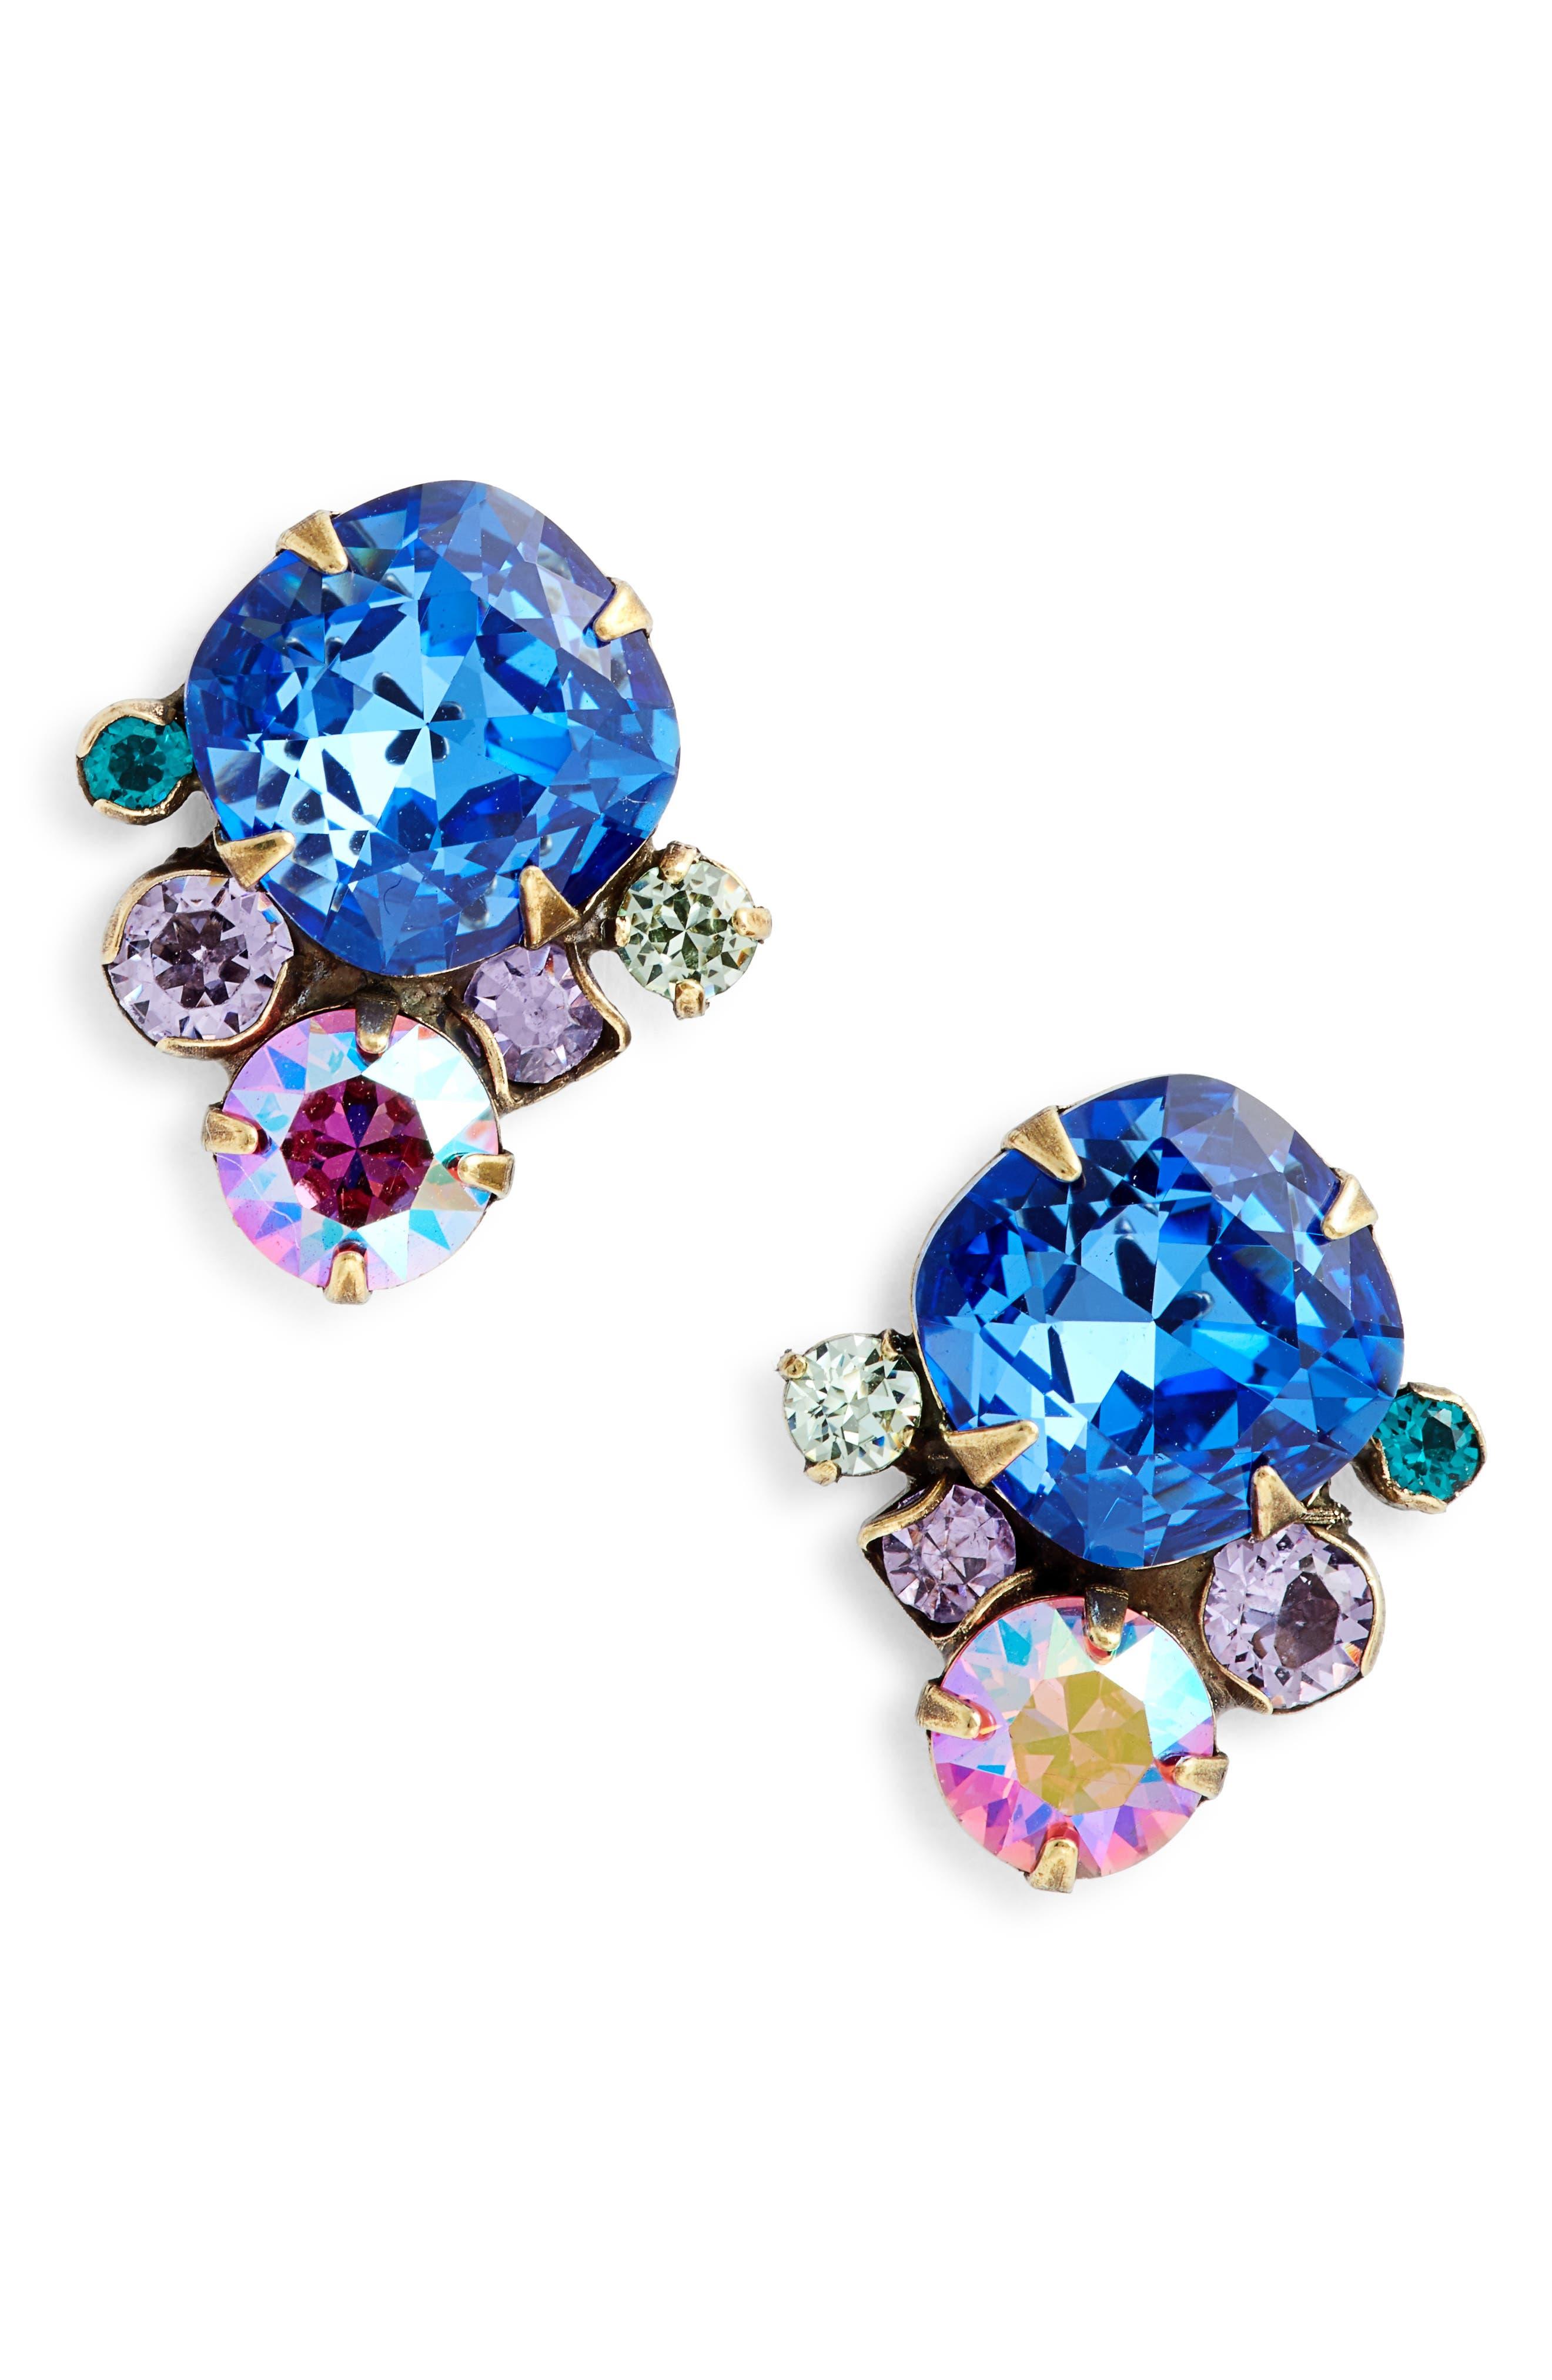 Brugmansia Crystal Earrings,                             Main thumbnail 1, color,                             Blue